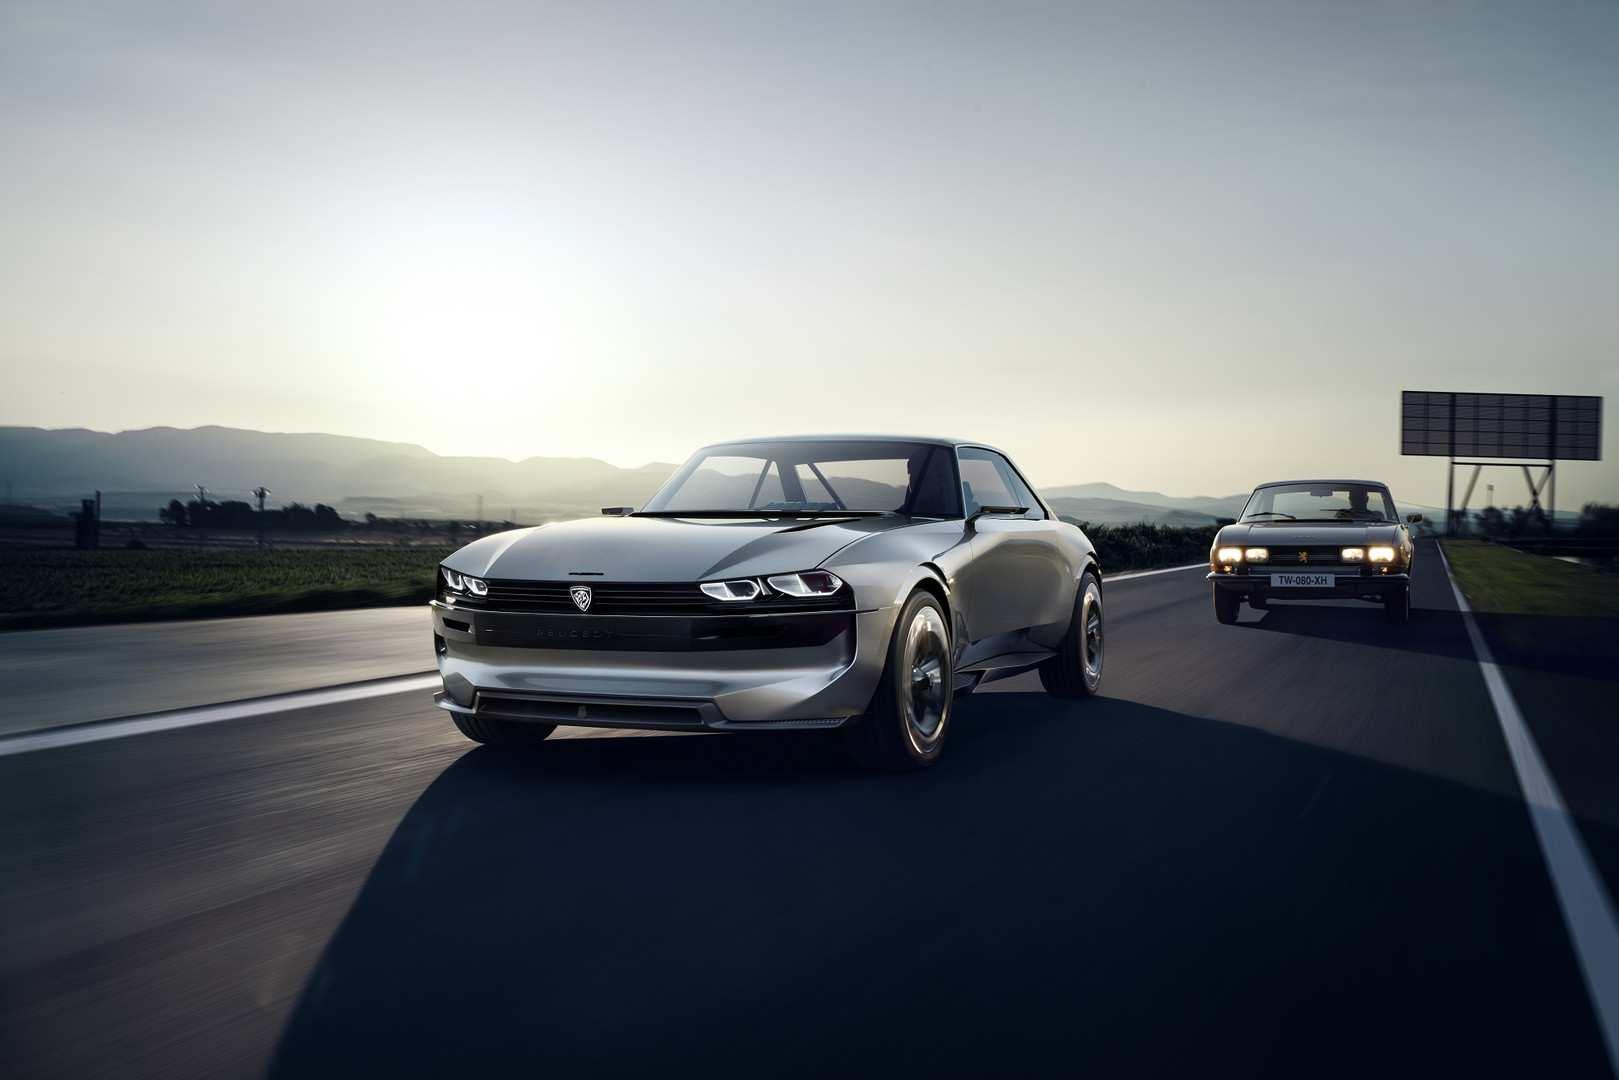 69 New Peugeot Modelle 2019 New Concept with Peugeot Modelle 2019